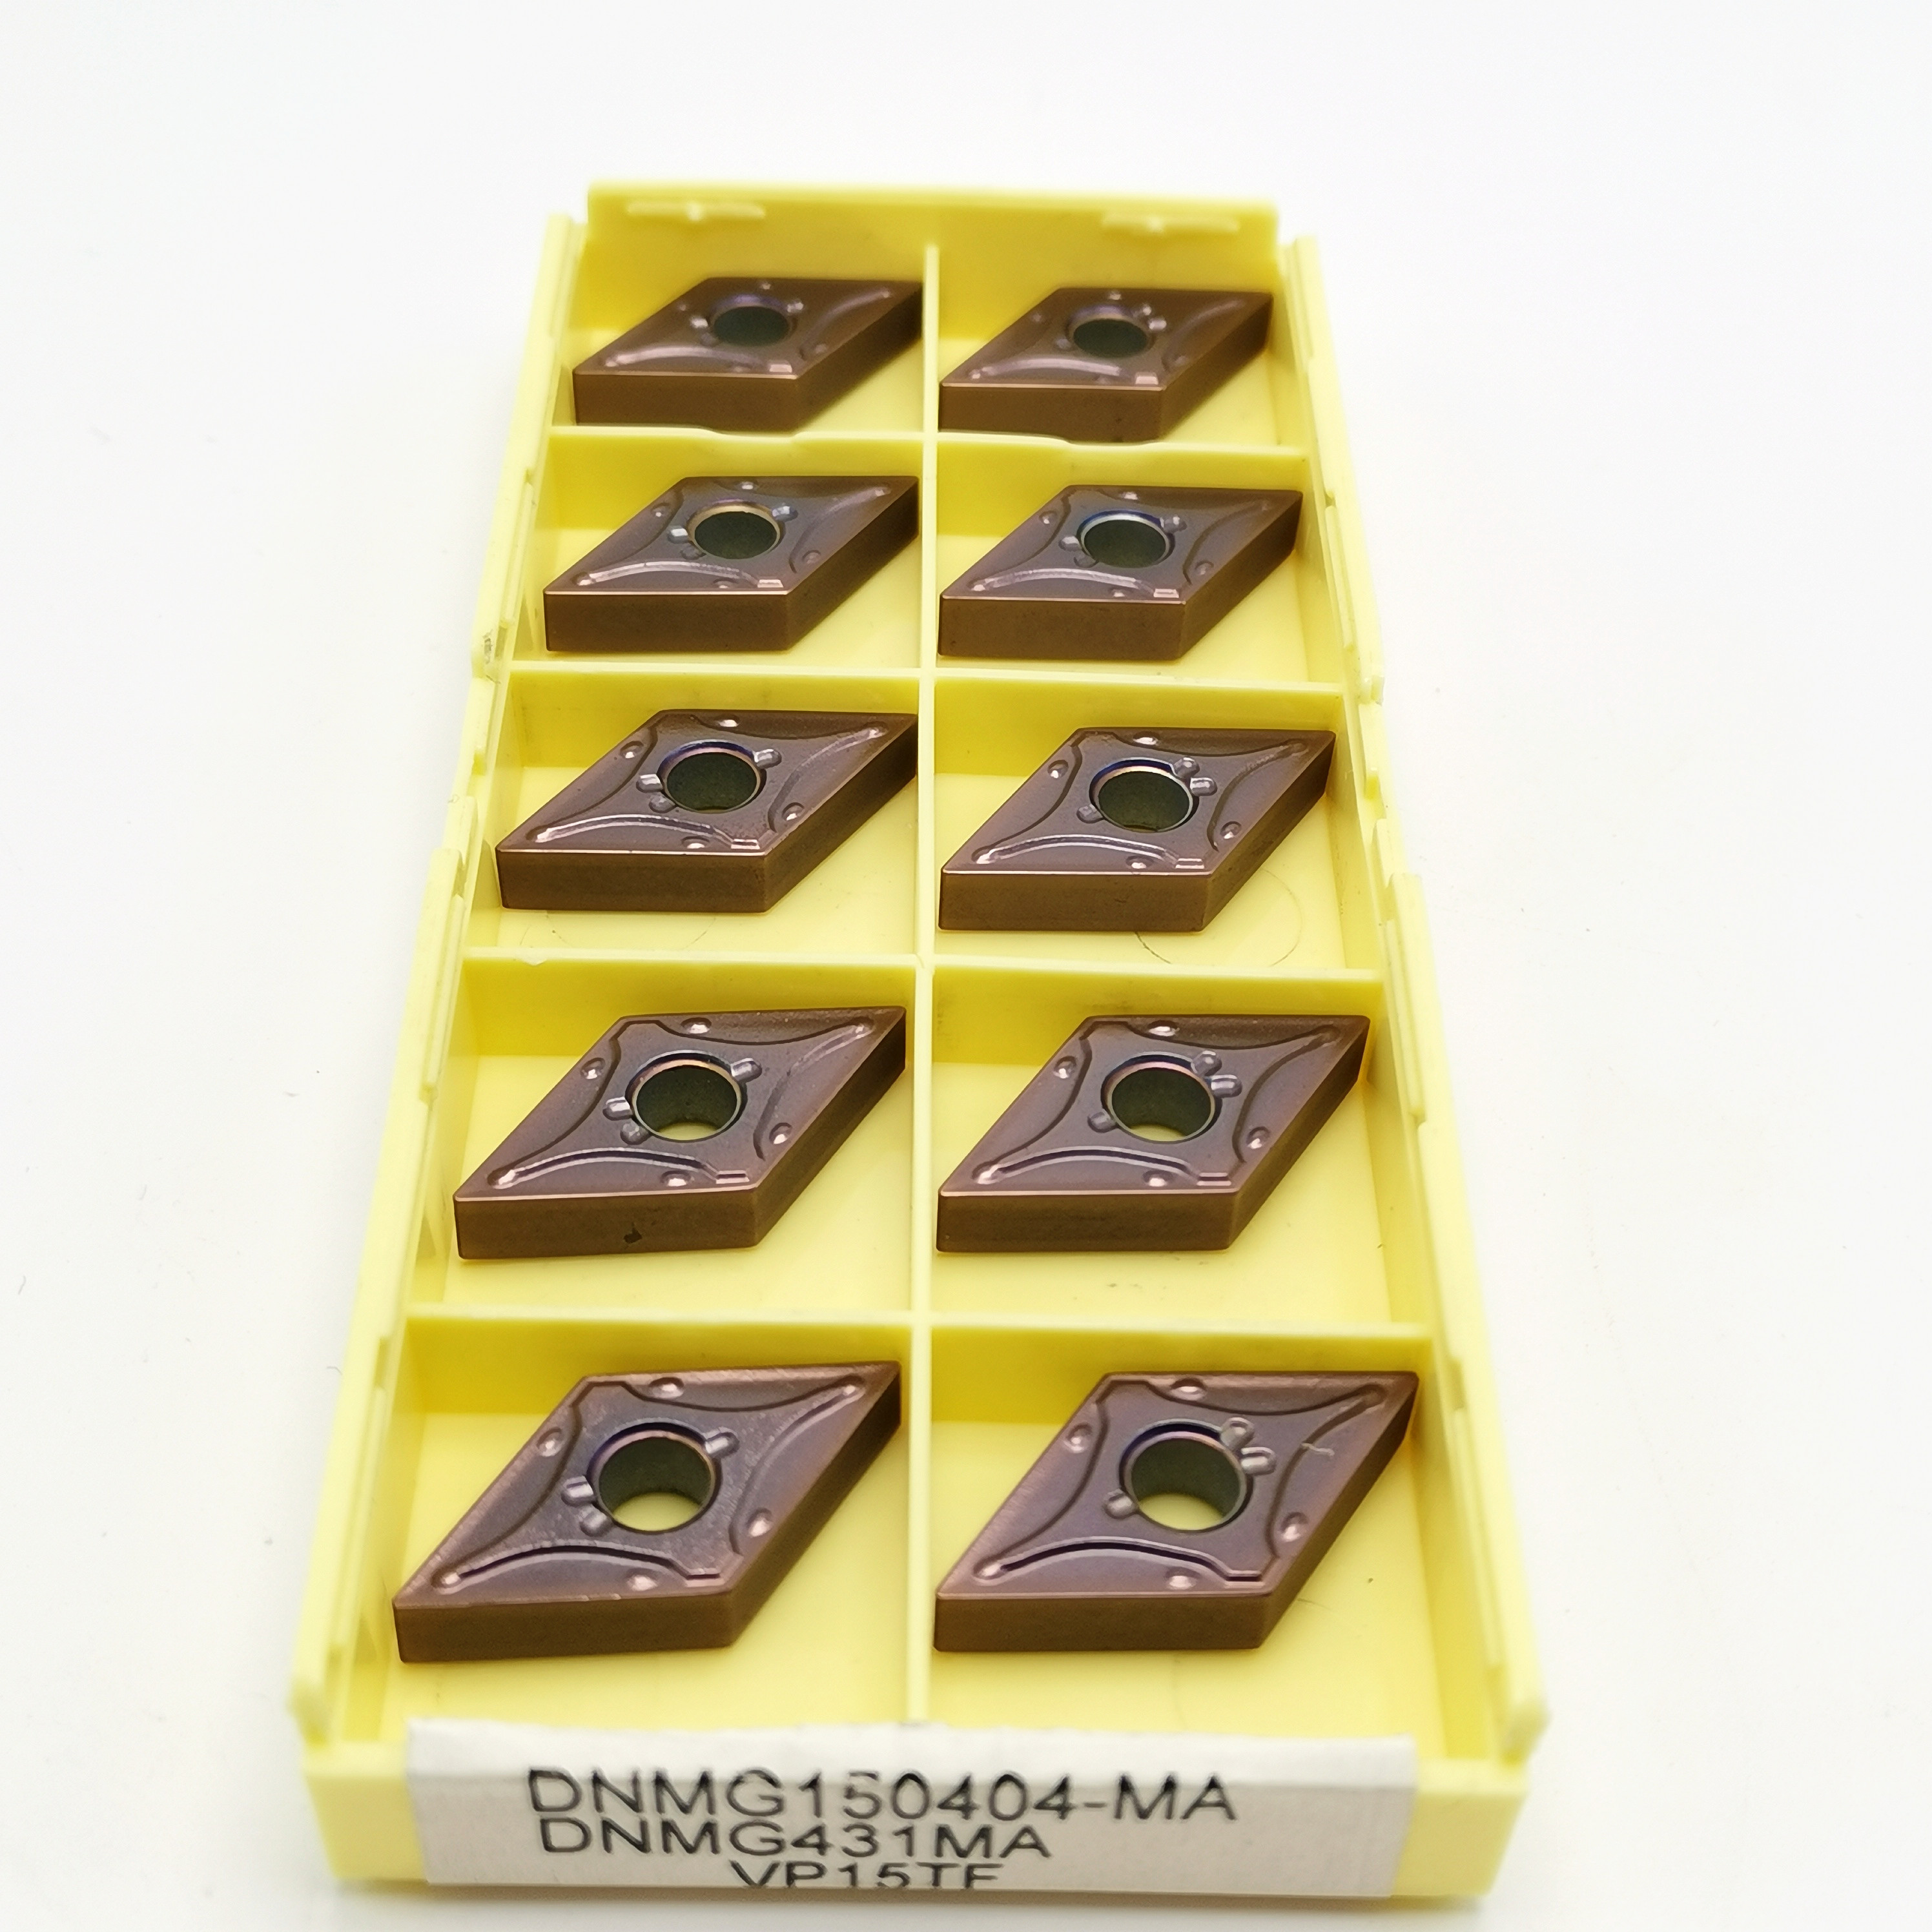 10PCS Carbide Insert DNMG150404 MA VP15TF UE6020 US735 High Quality CNC Lathe Tool DNMG 150404 Milling Lathe Tool